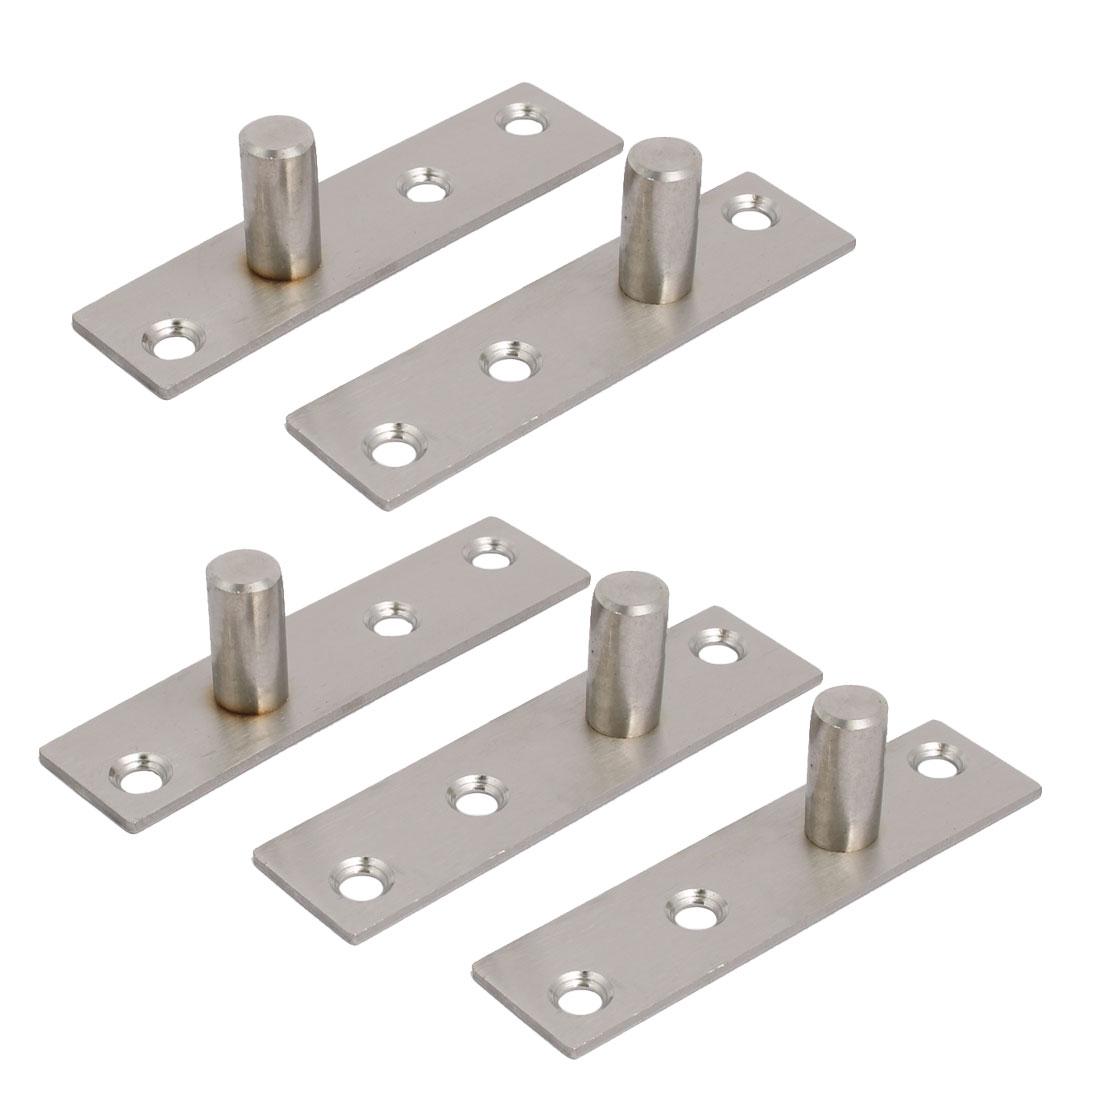 97mm Length Stainless Steel Hidden Door Pivot Hinges Silver Tone 5pcs